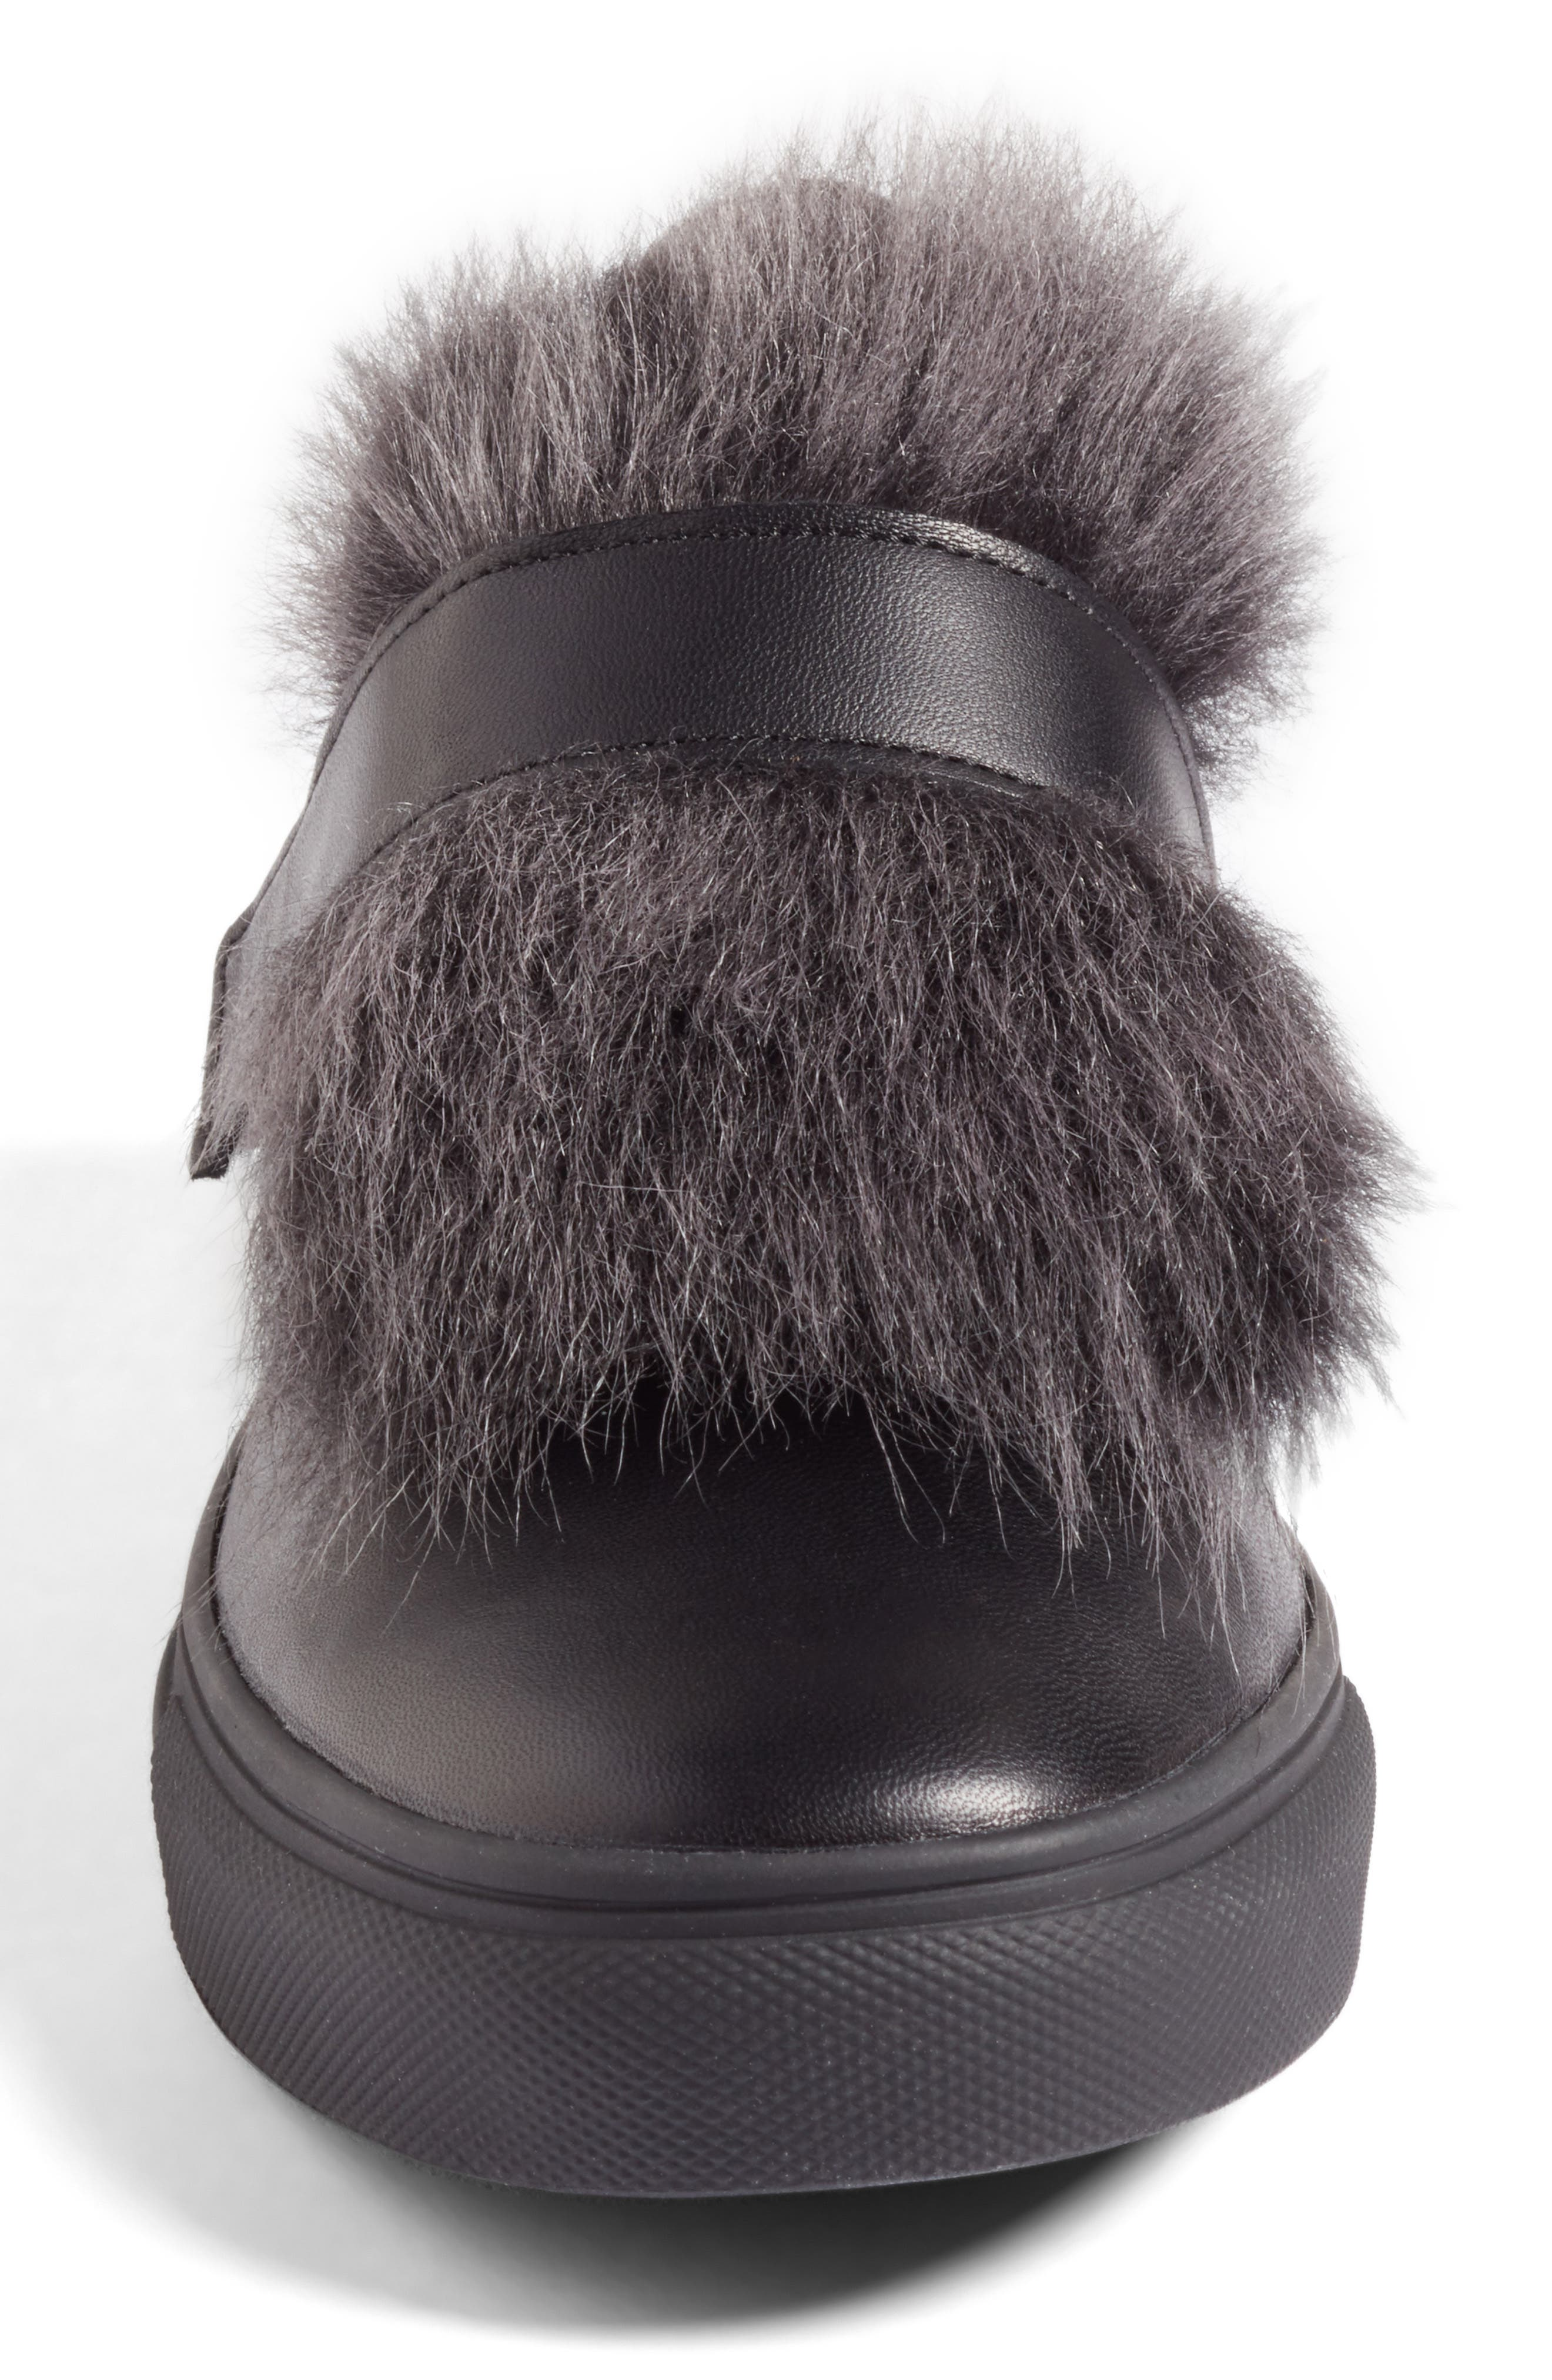 Kennel & Schmenger Basket Slip-On Sneaker with Genuine Shearling Trim,                             Alternate thumbnail 4, color,                             Black